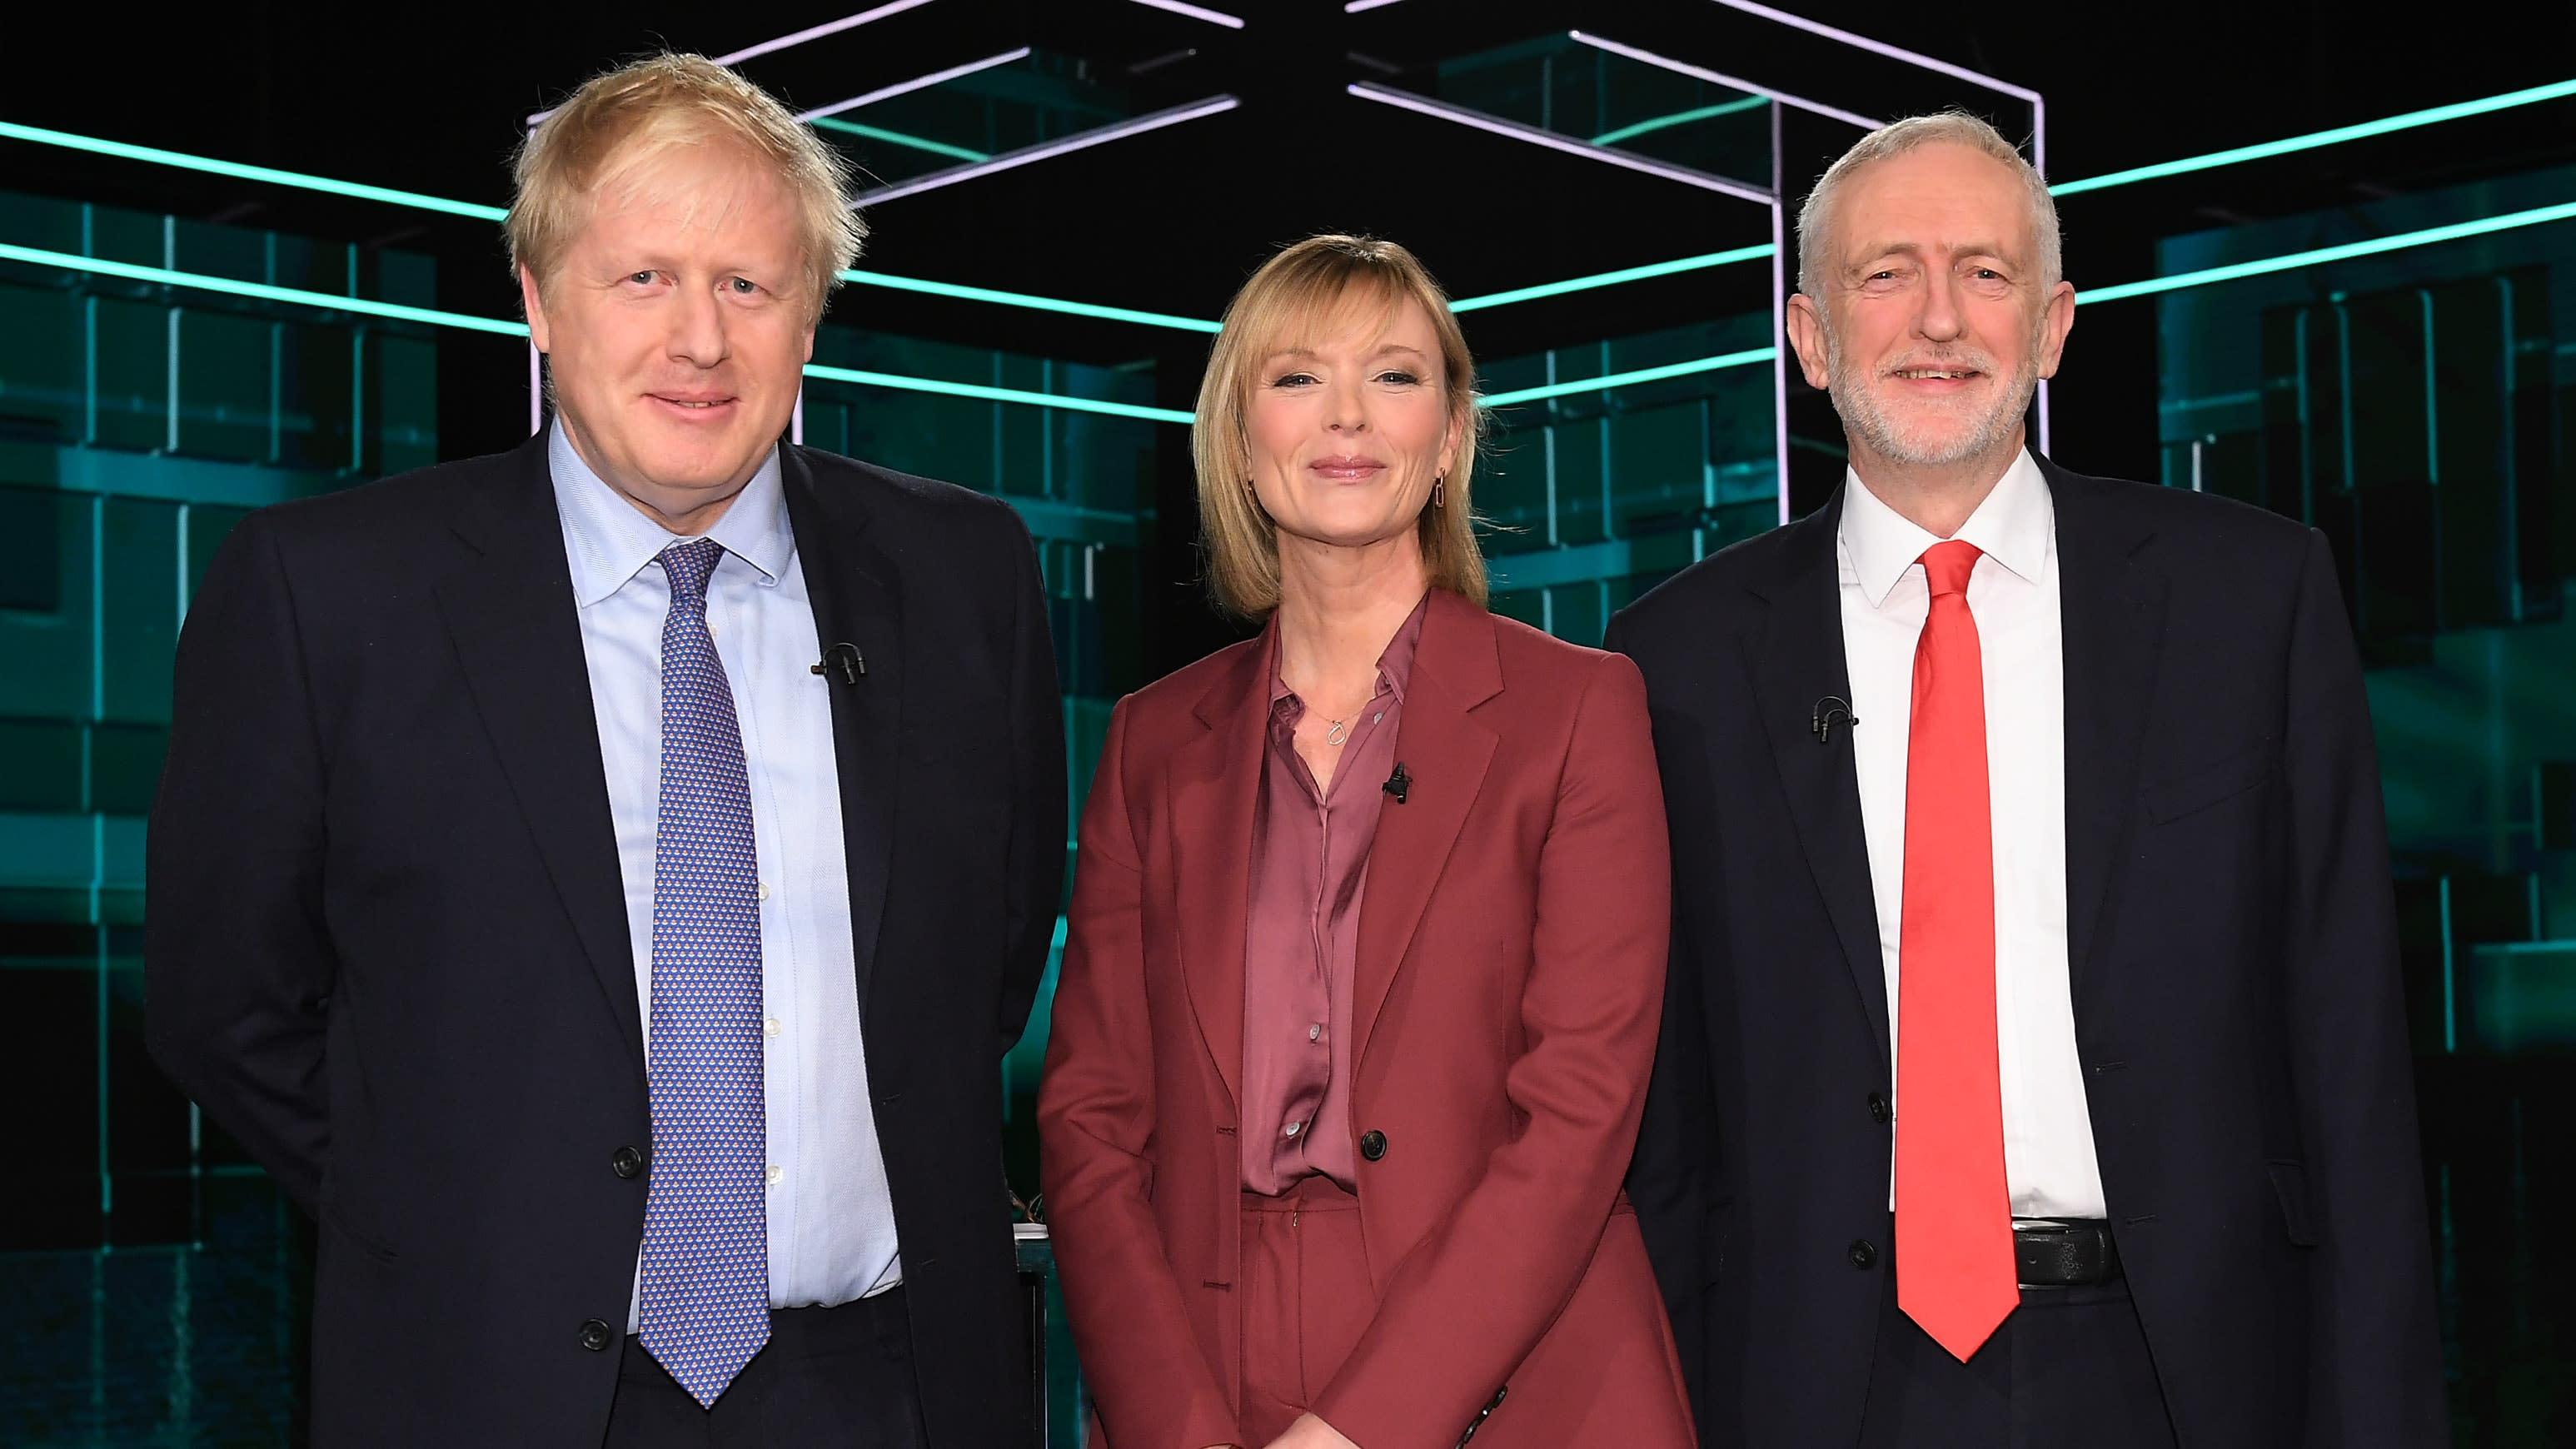 Corbyn dismisses Johnson's pledge to get Brexit done as 'nonsense'